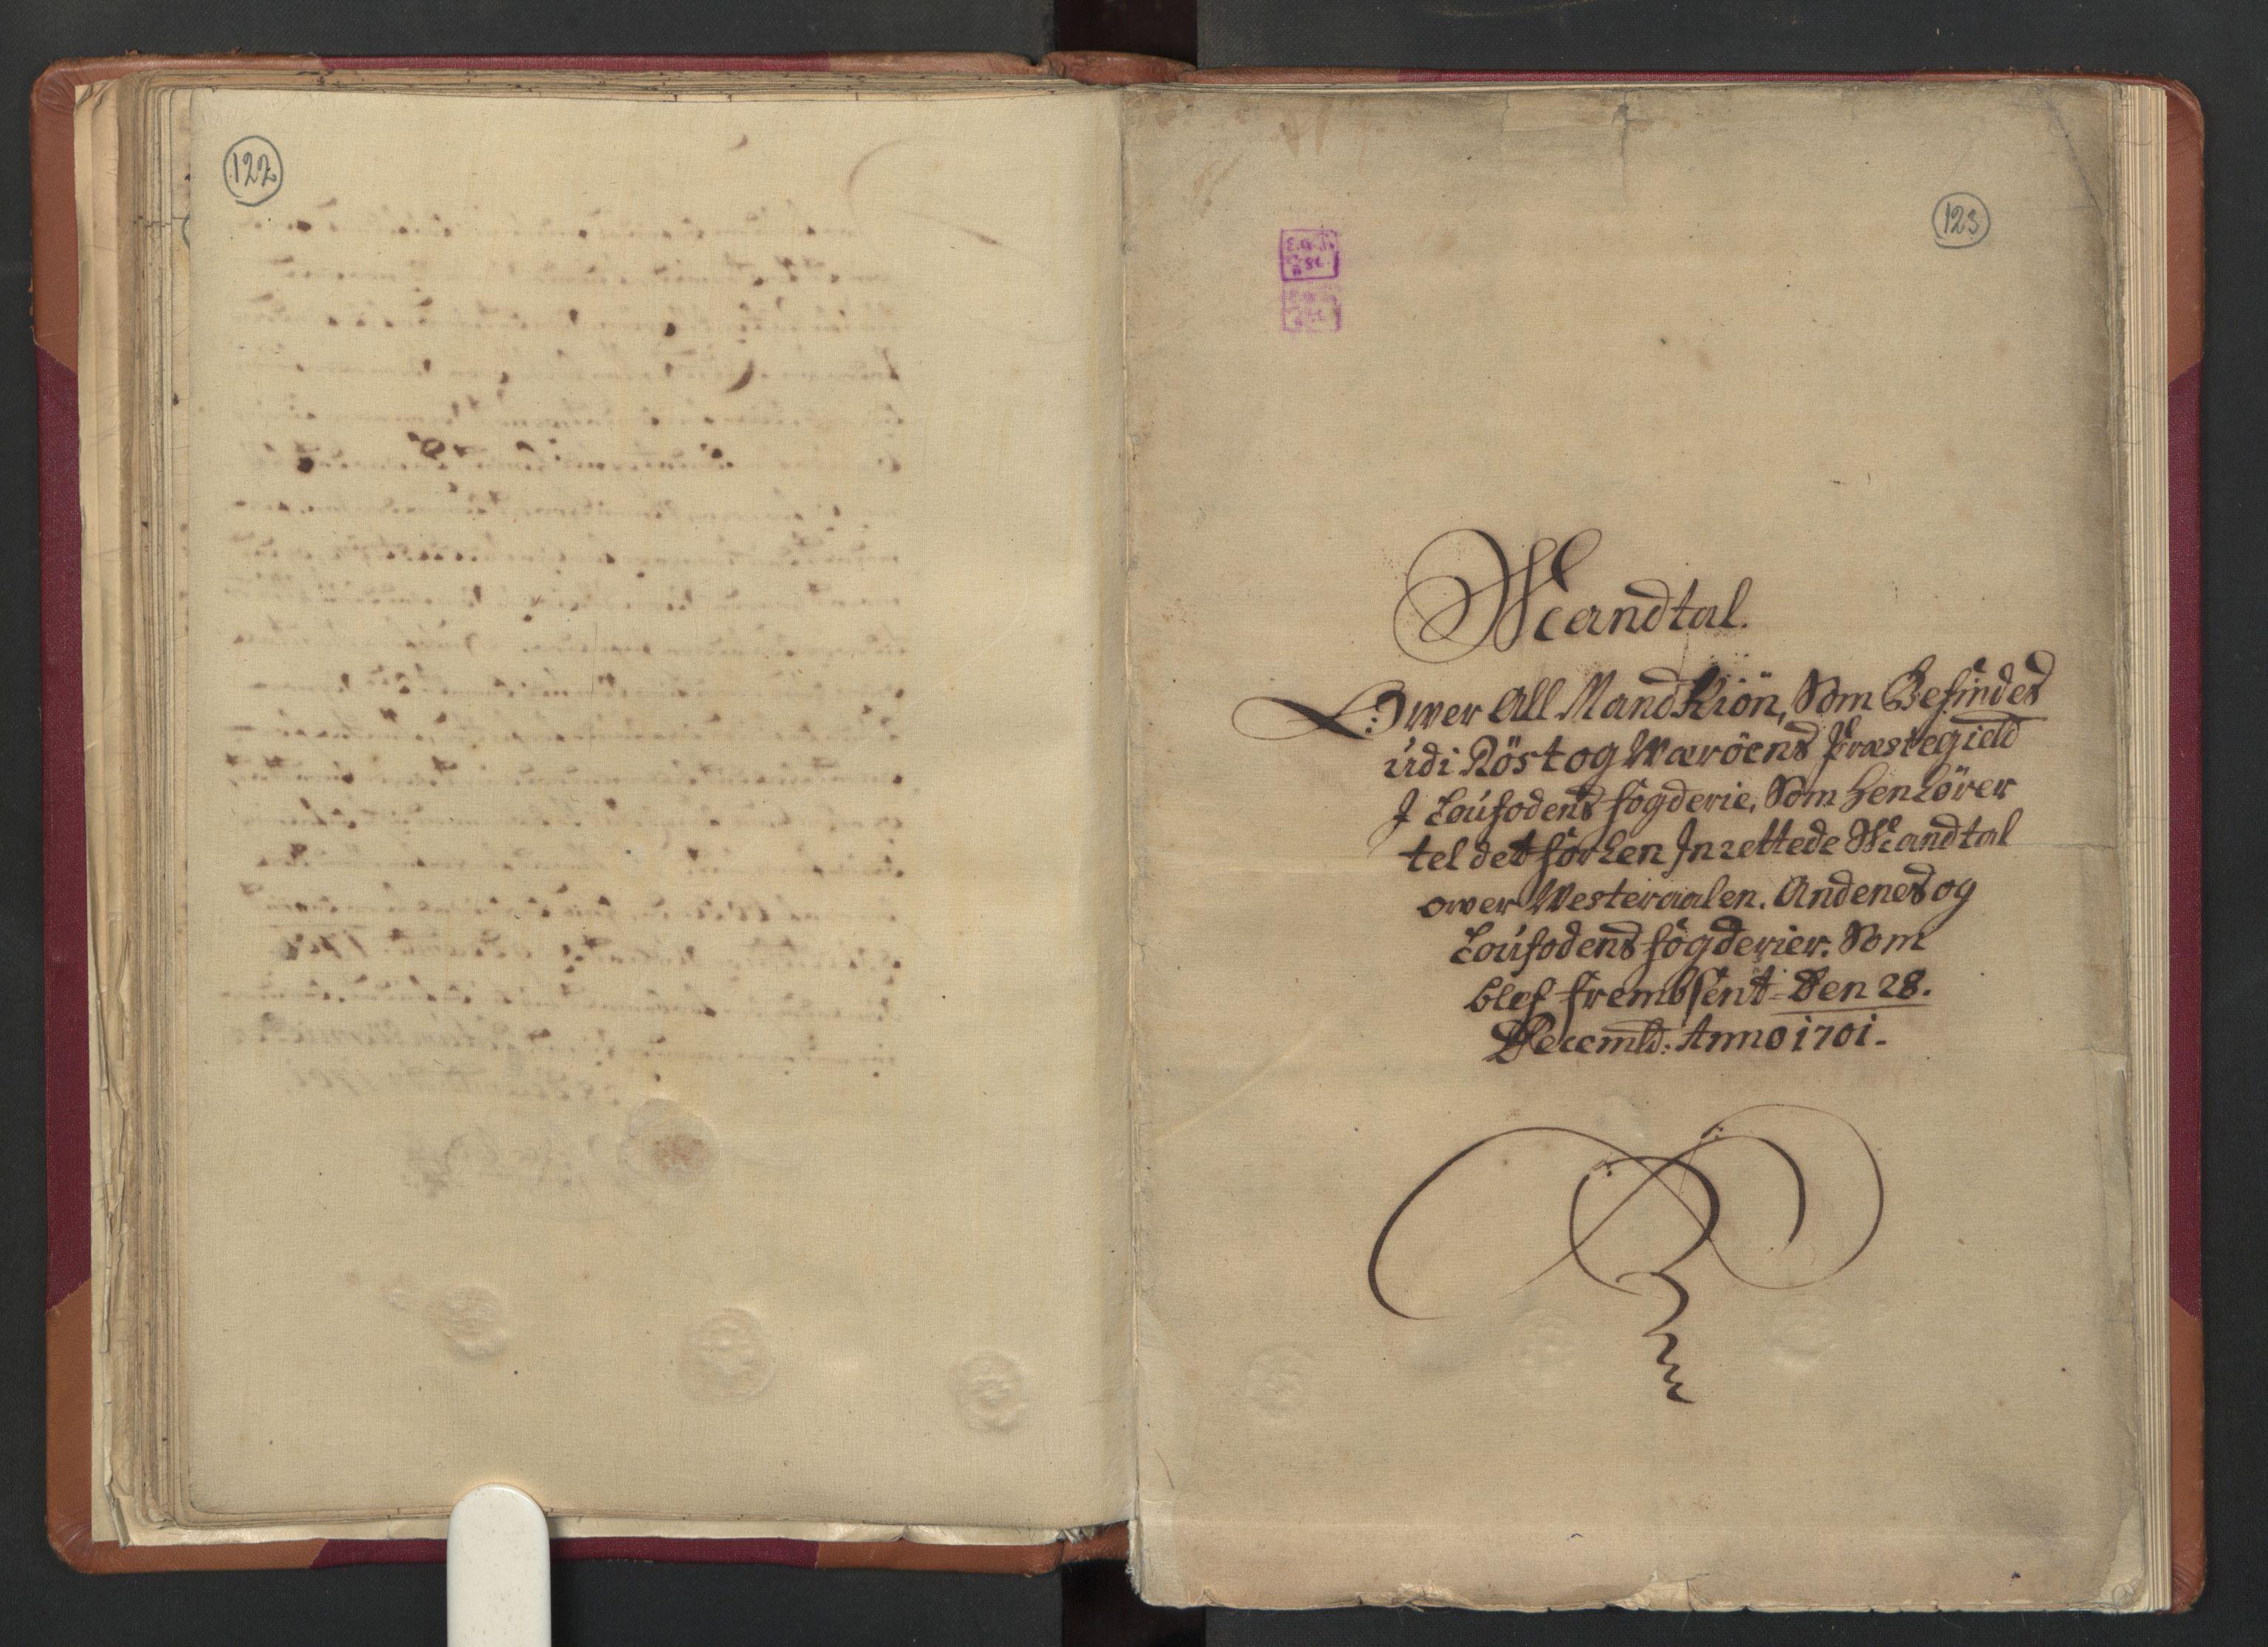 RA, Manntallet 1701, nr. 18: Vesterålen, Andenes og Lofoten fogderi, 1701, s. 122-123